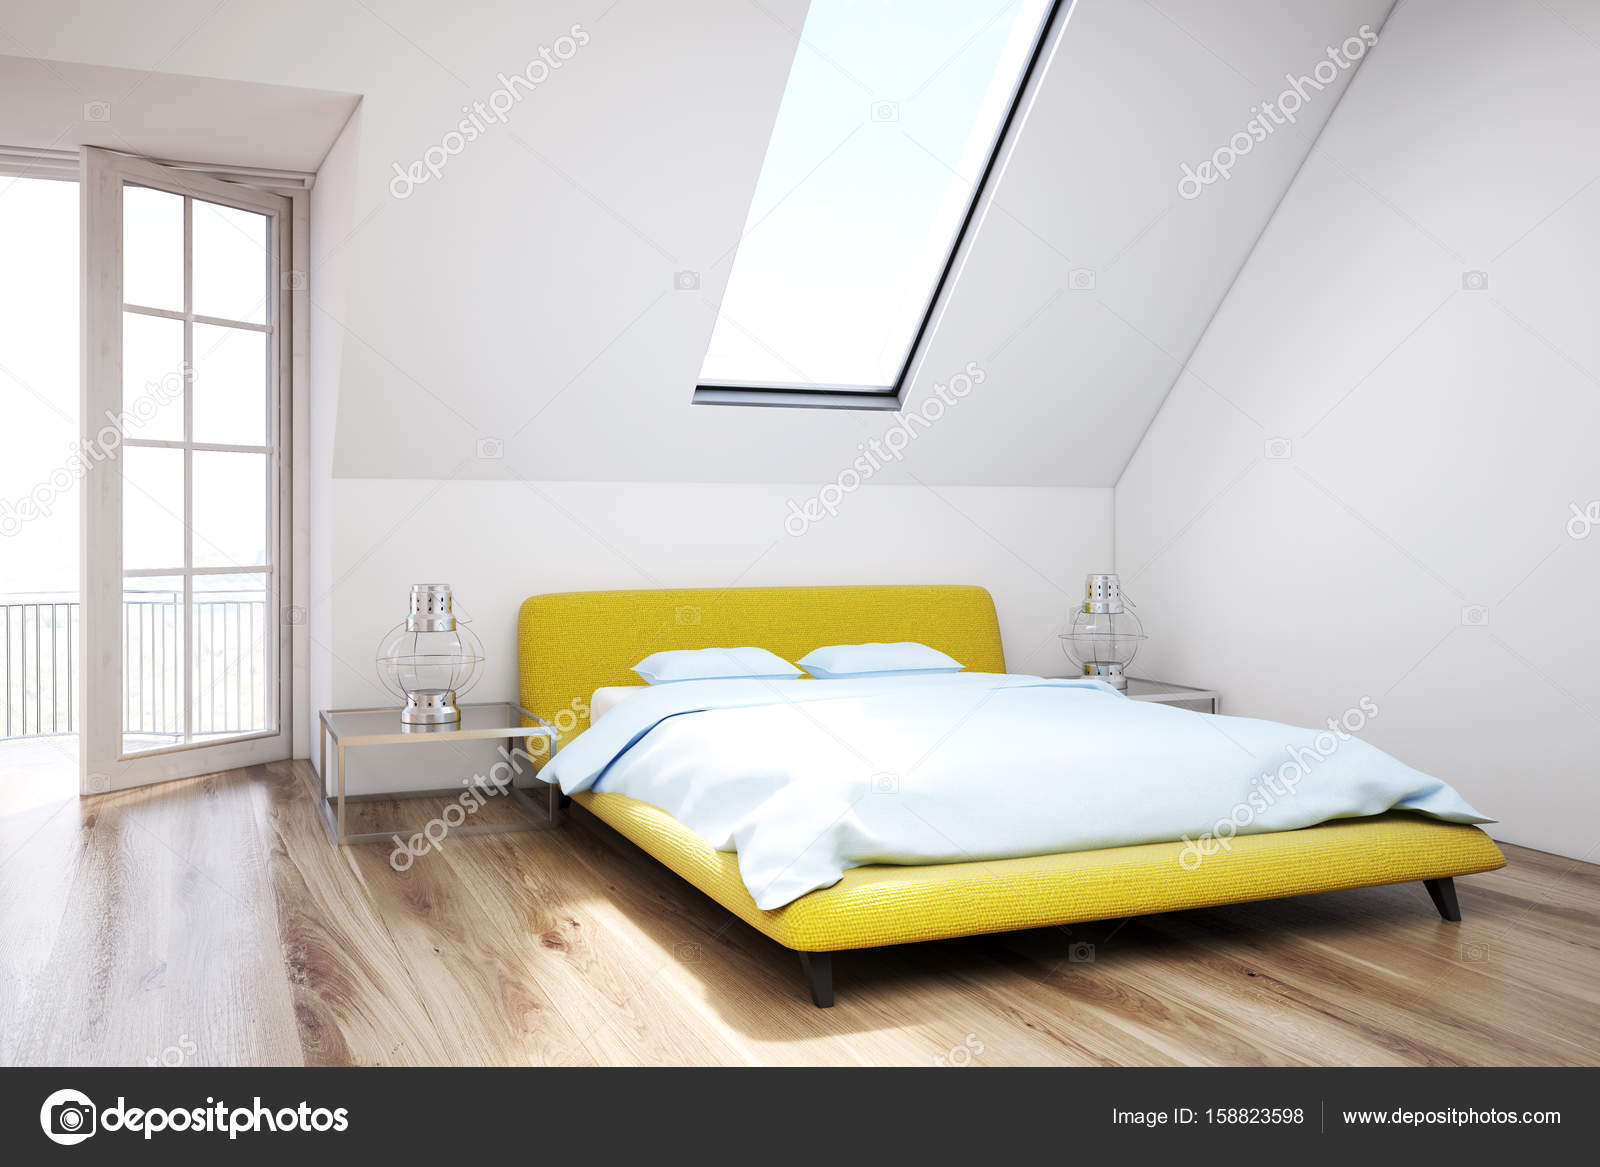 Slaapkamer Houten Vloer : Witte zolder slaapkamer houten vloer close up u stockfoto